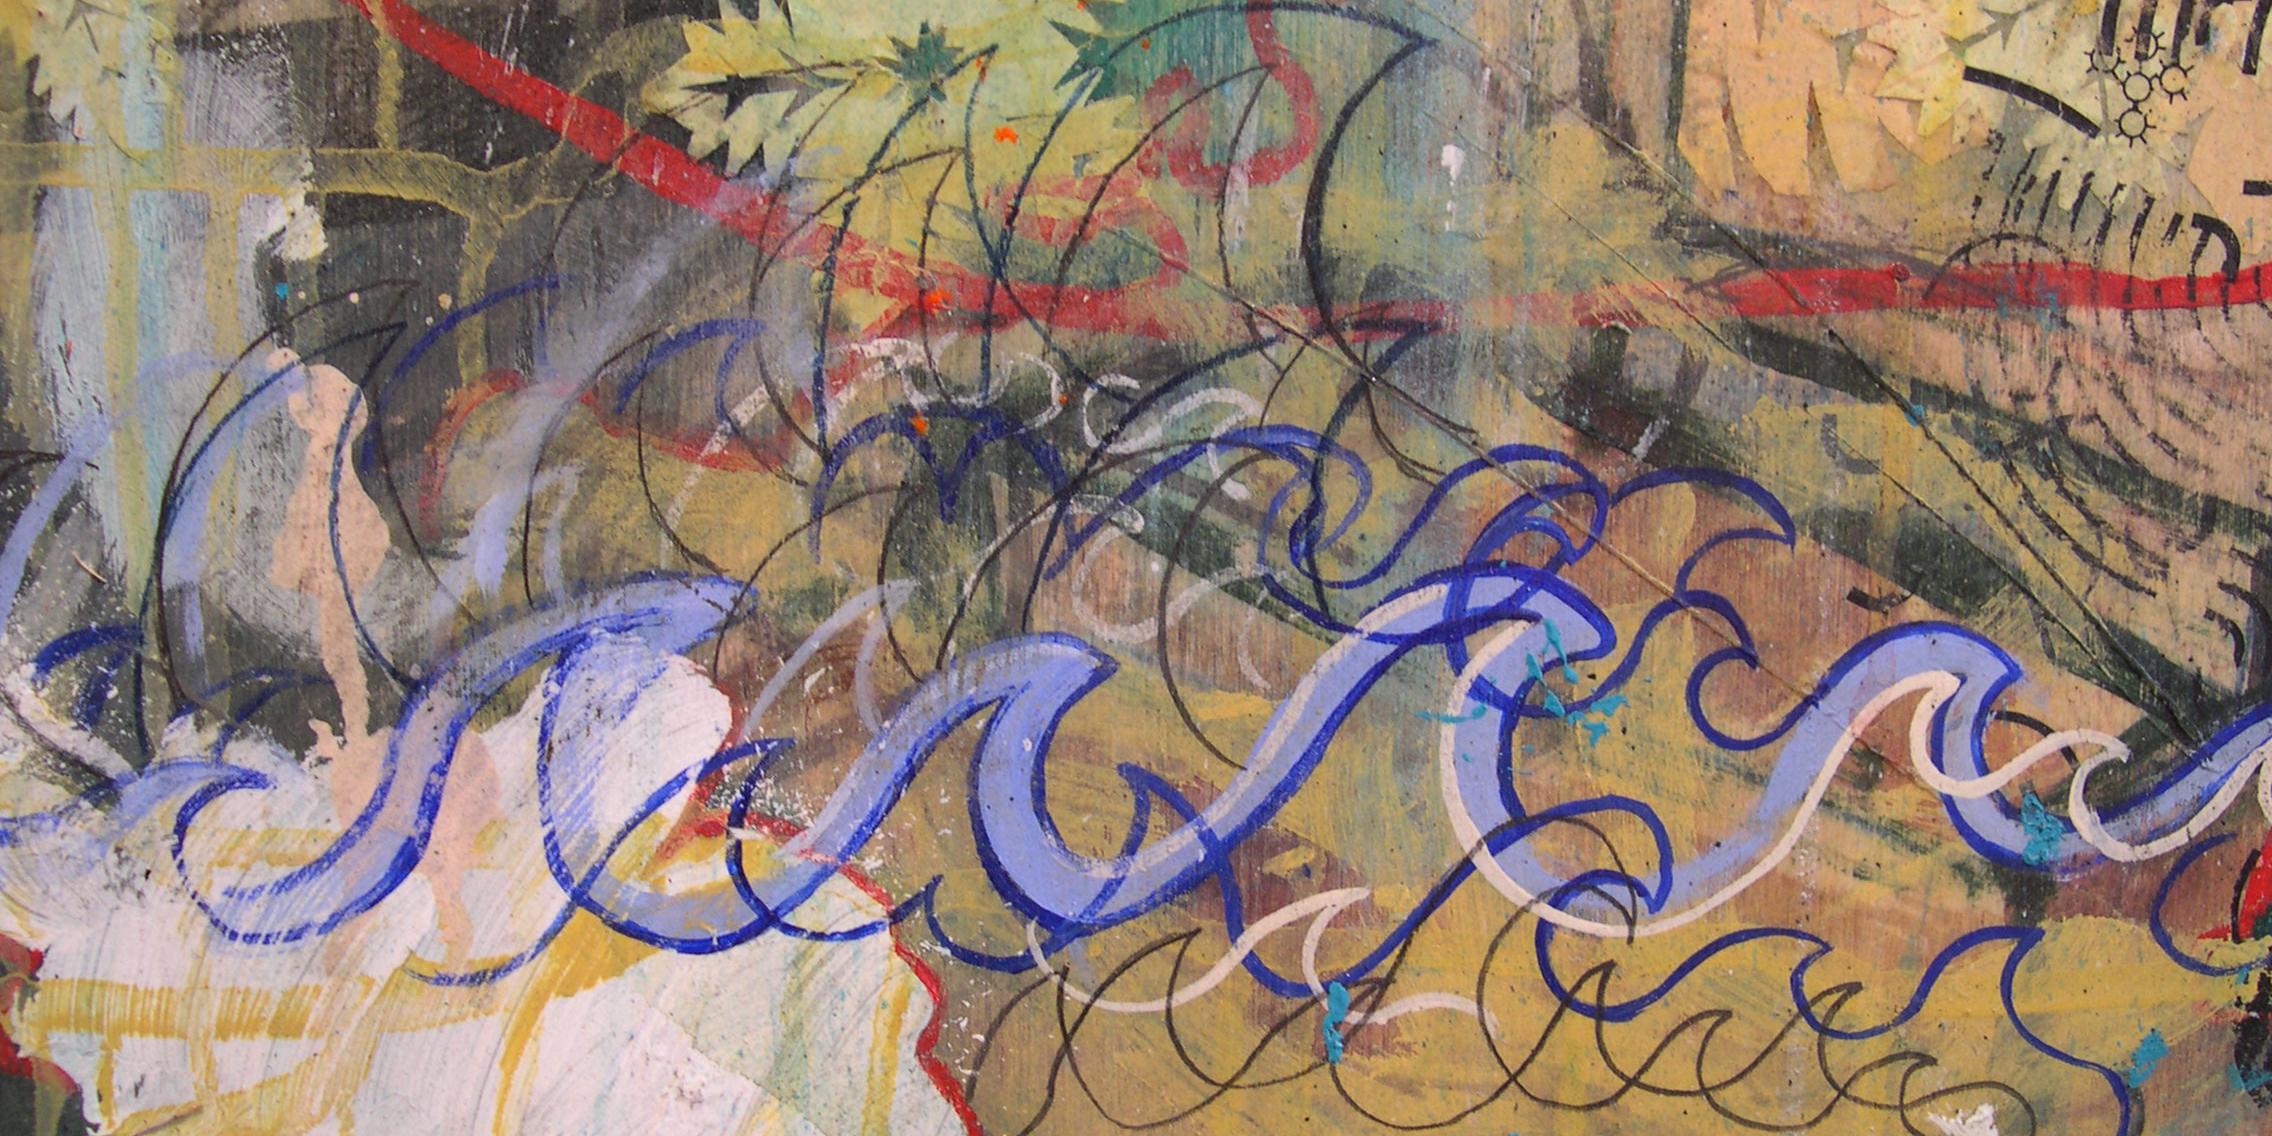 Sue Chenoweth: Curated by Susan Krane